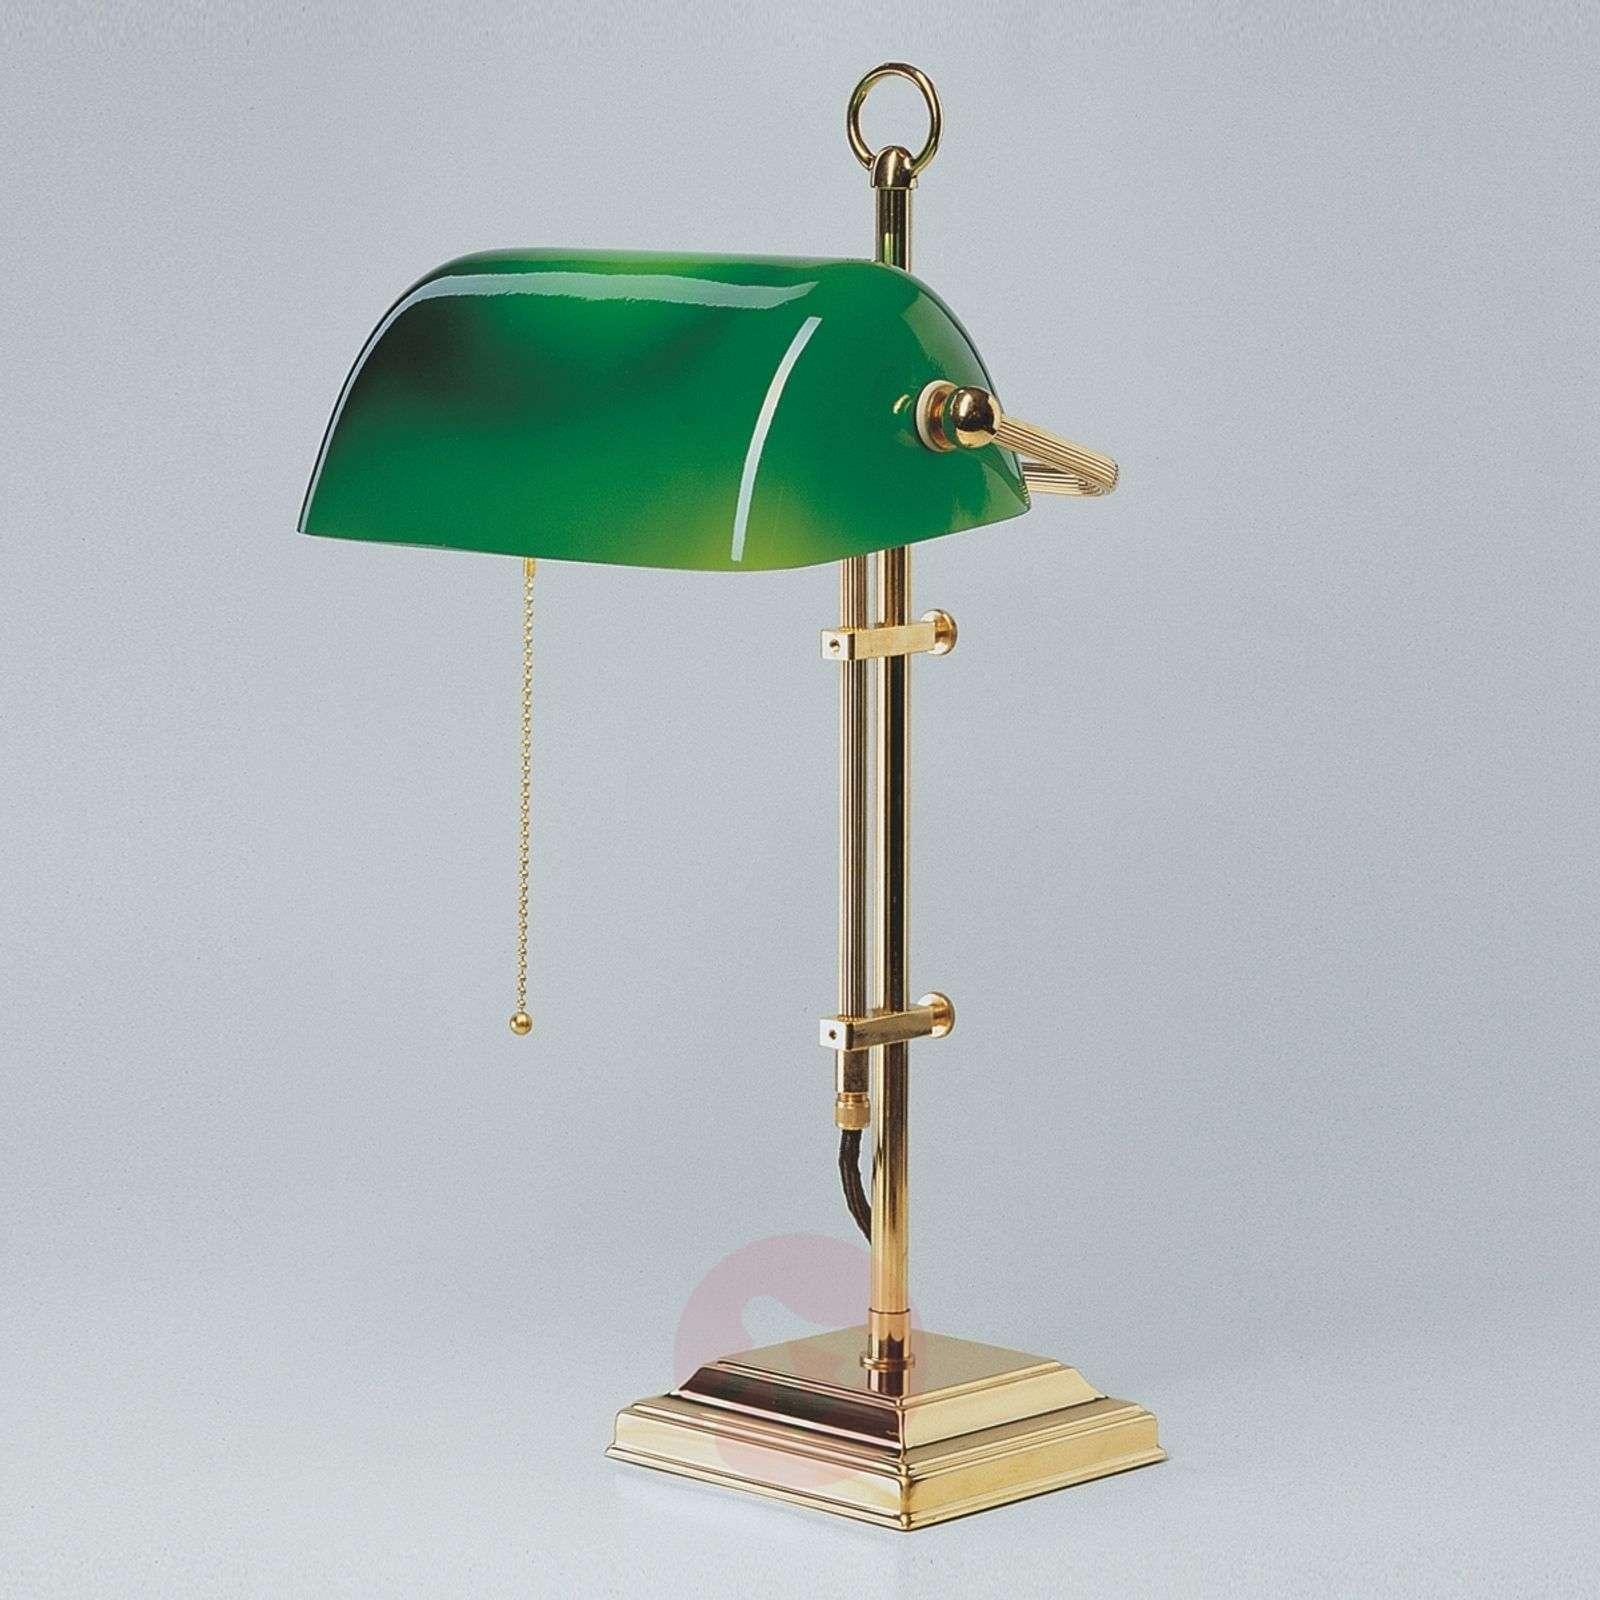 GITA bankers lamp made of polished brass-1542004-01